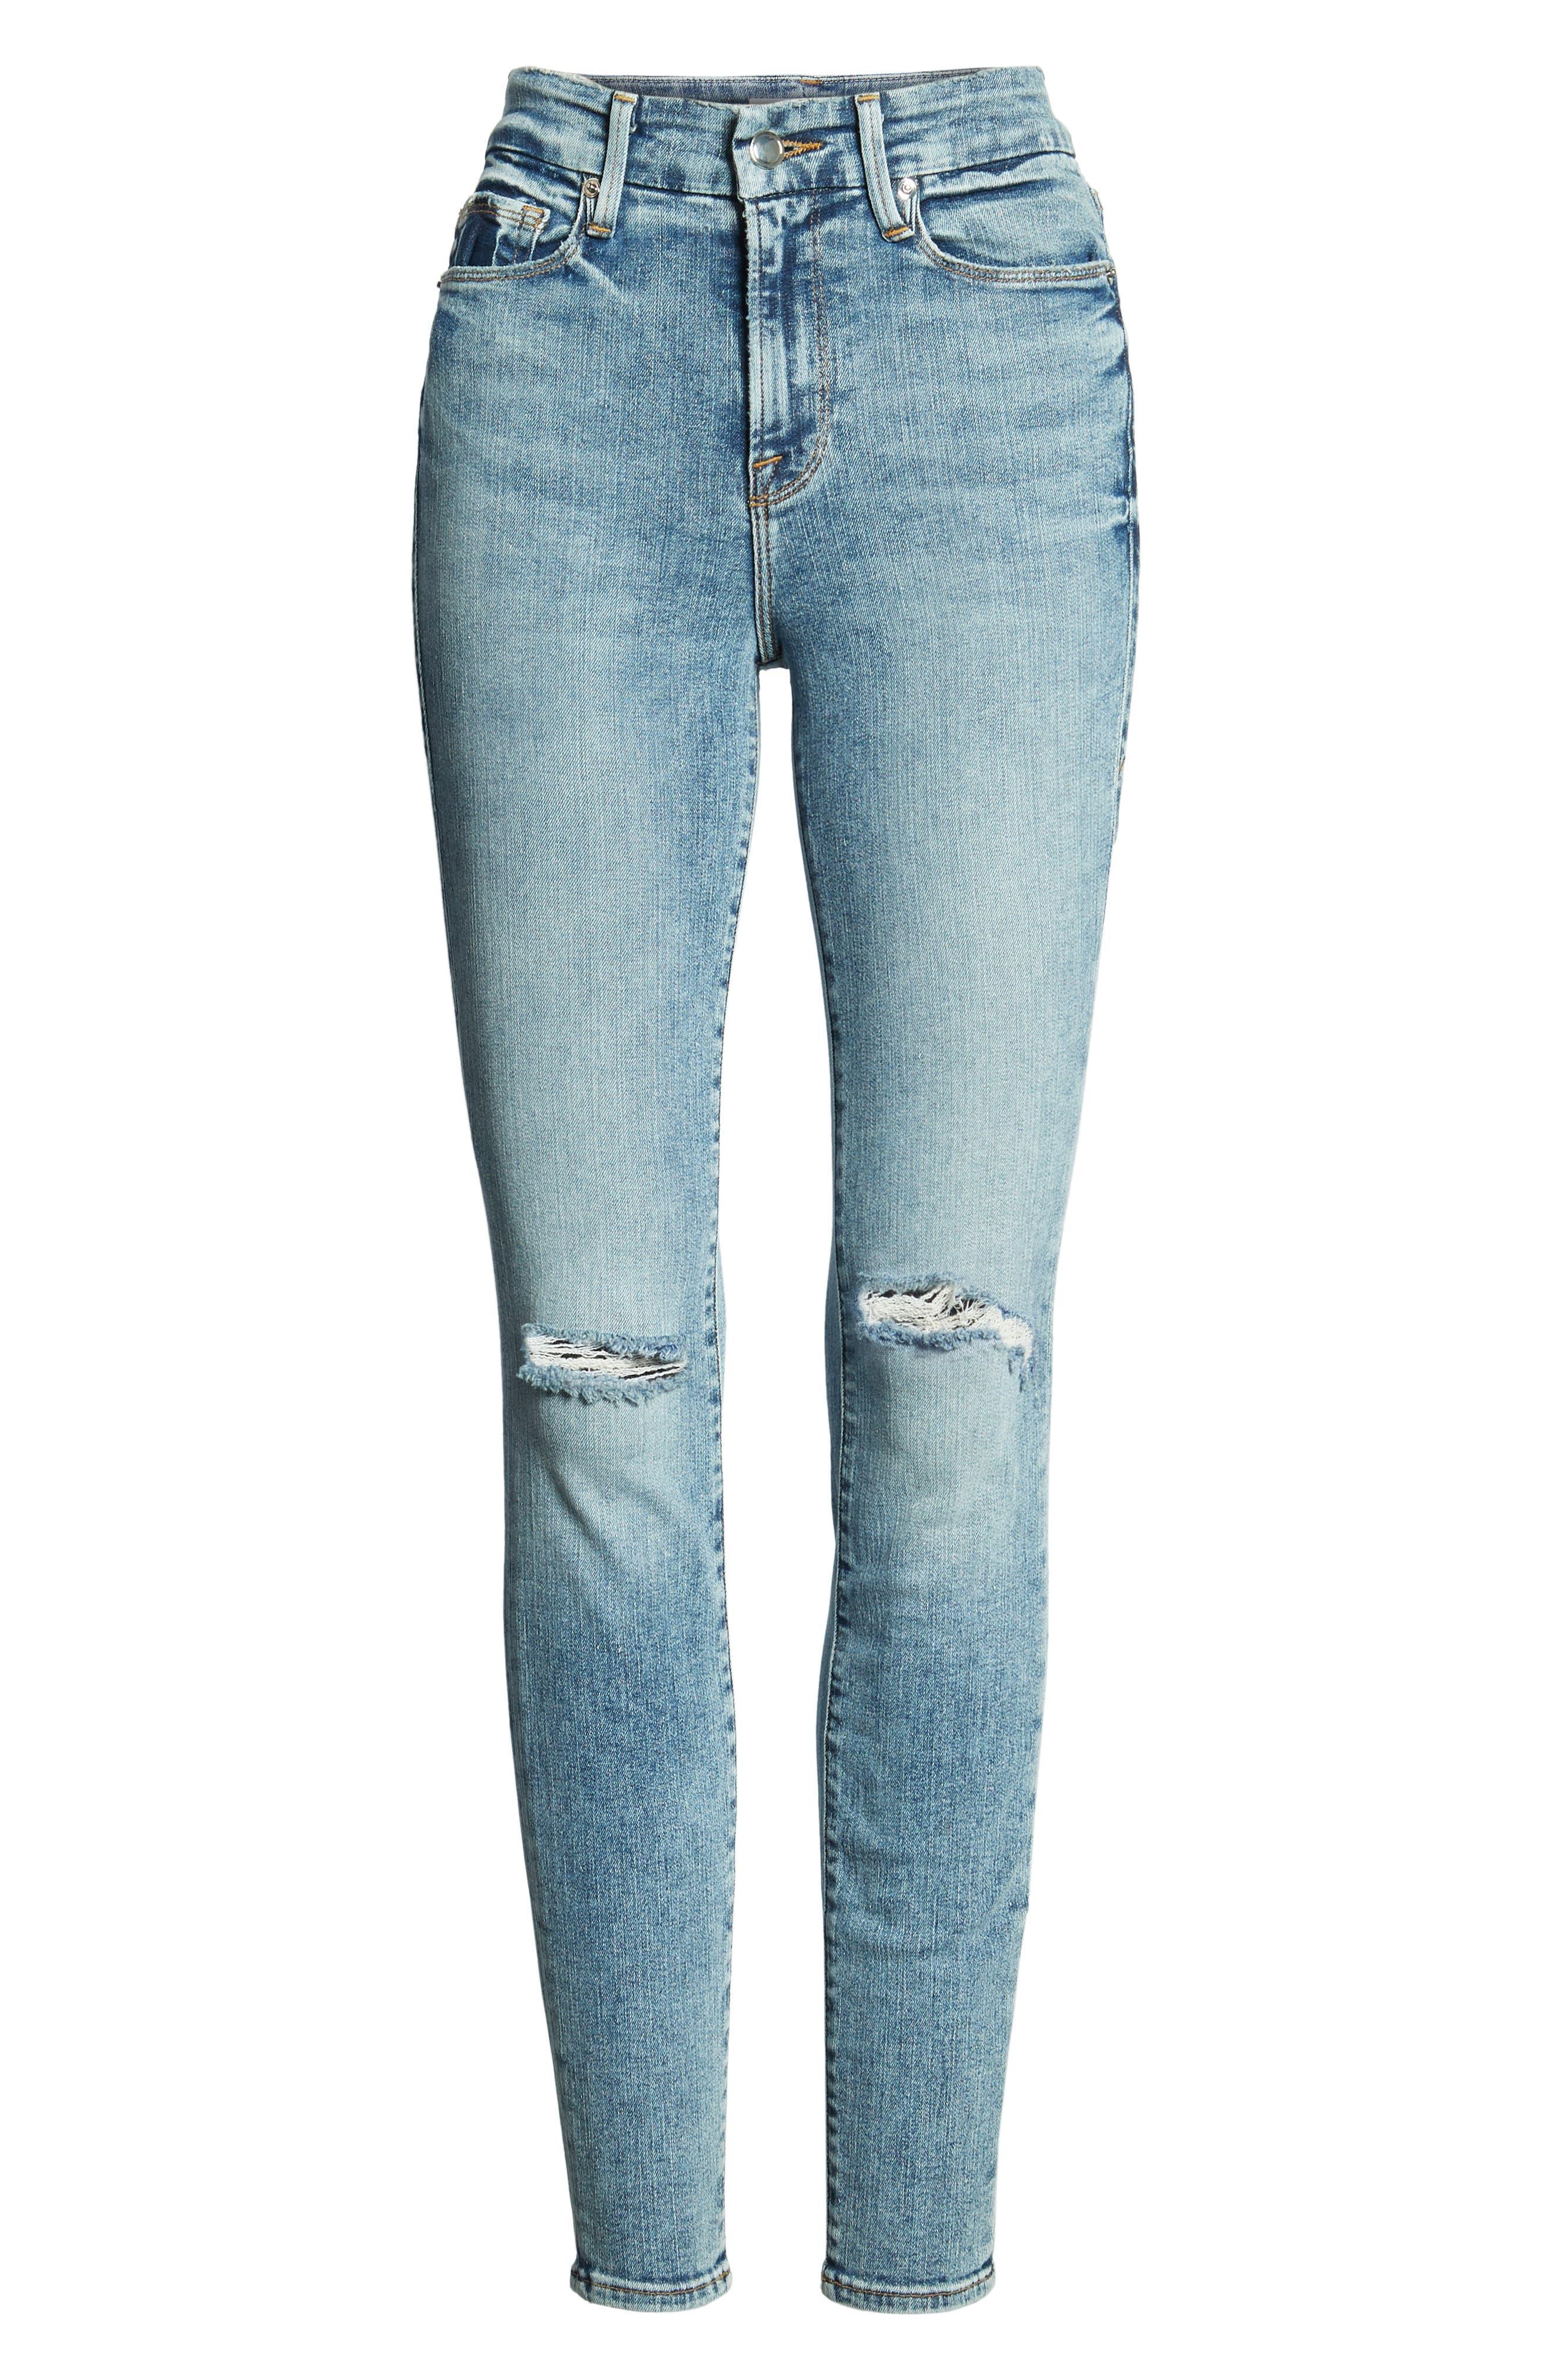 Good Legs Ripped High Waist Skinny Jeans,                             Alternate thumbnail 7, color,                             BLUE129